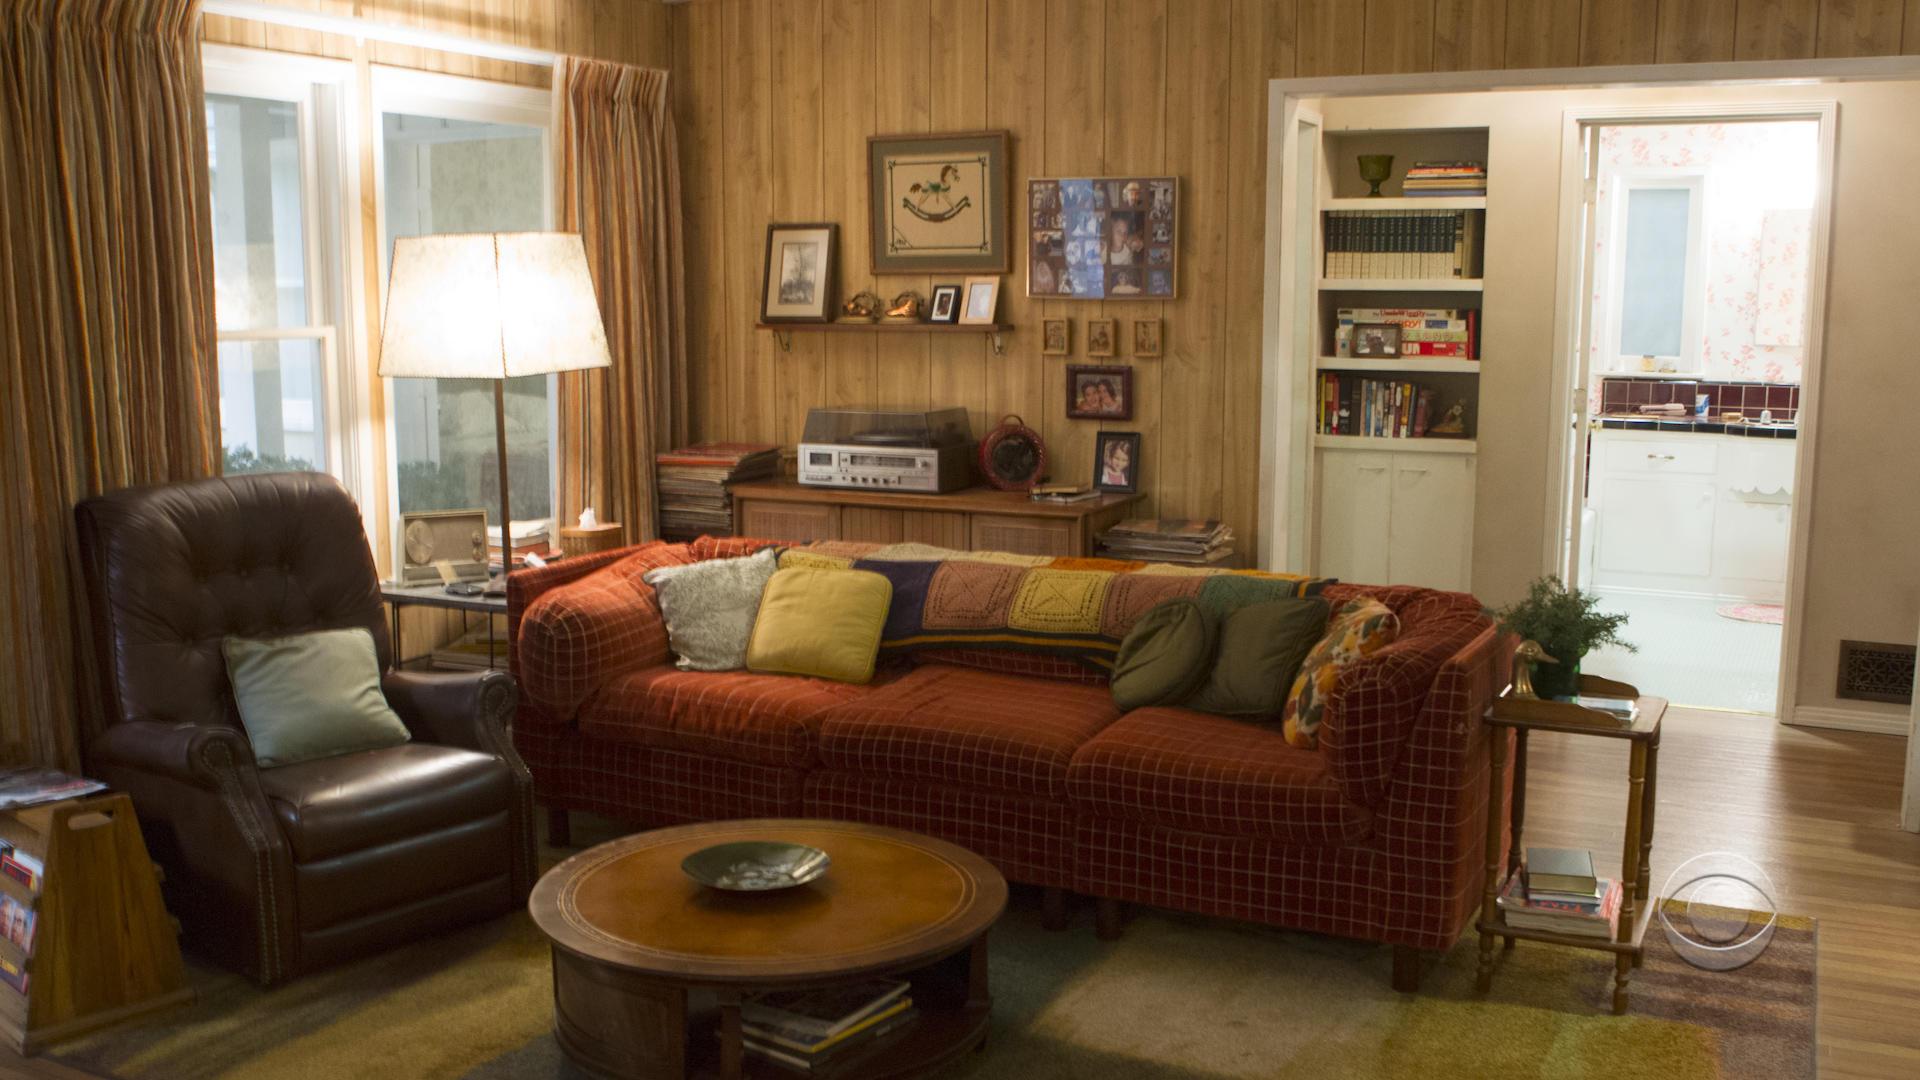 young-sheldon-living-room.jpg